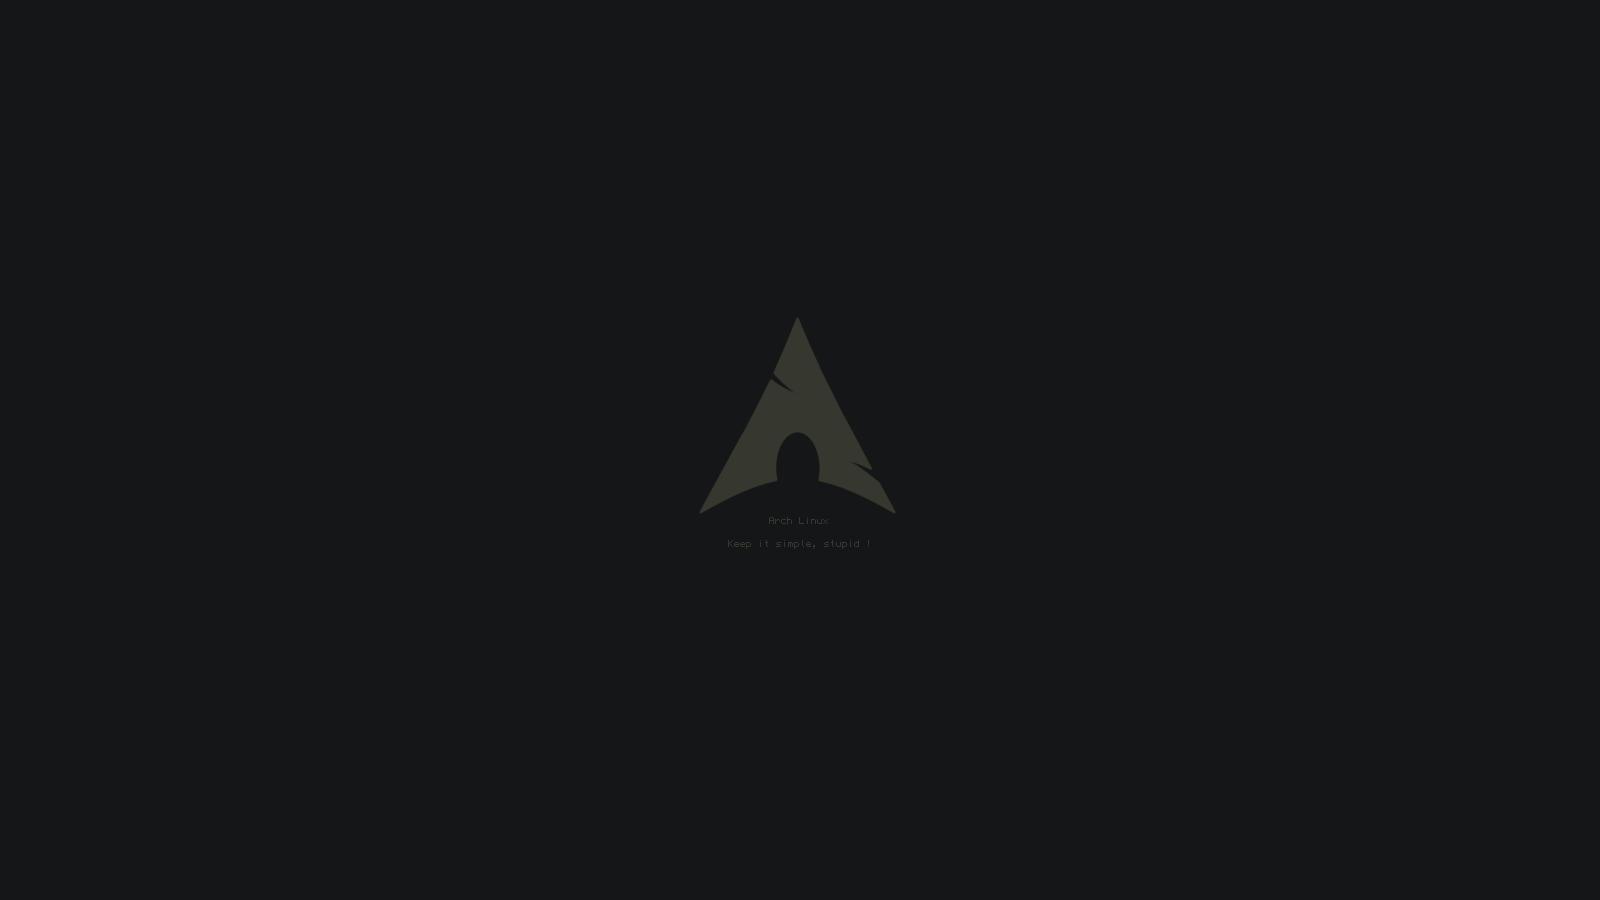 arch grey wallpaper pack by v4arg on deviantart